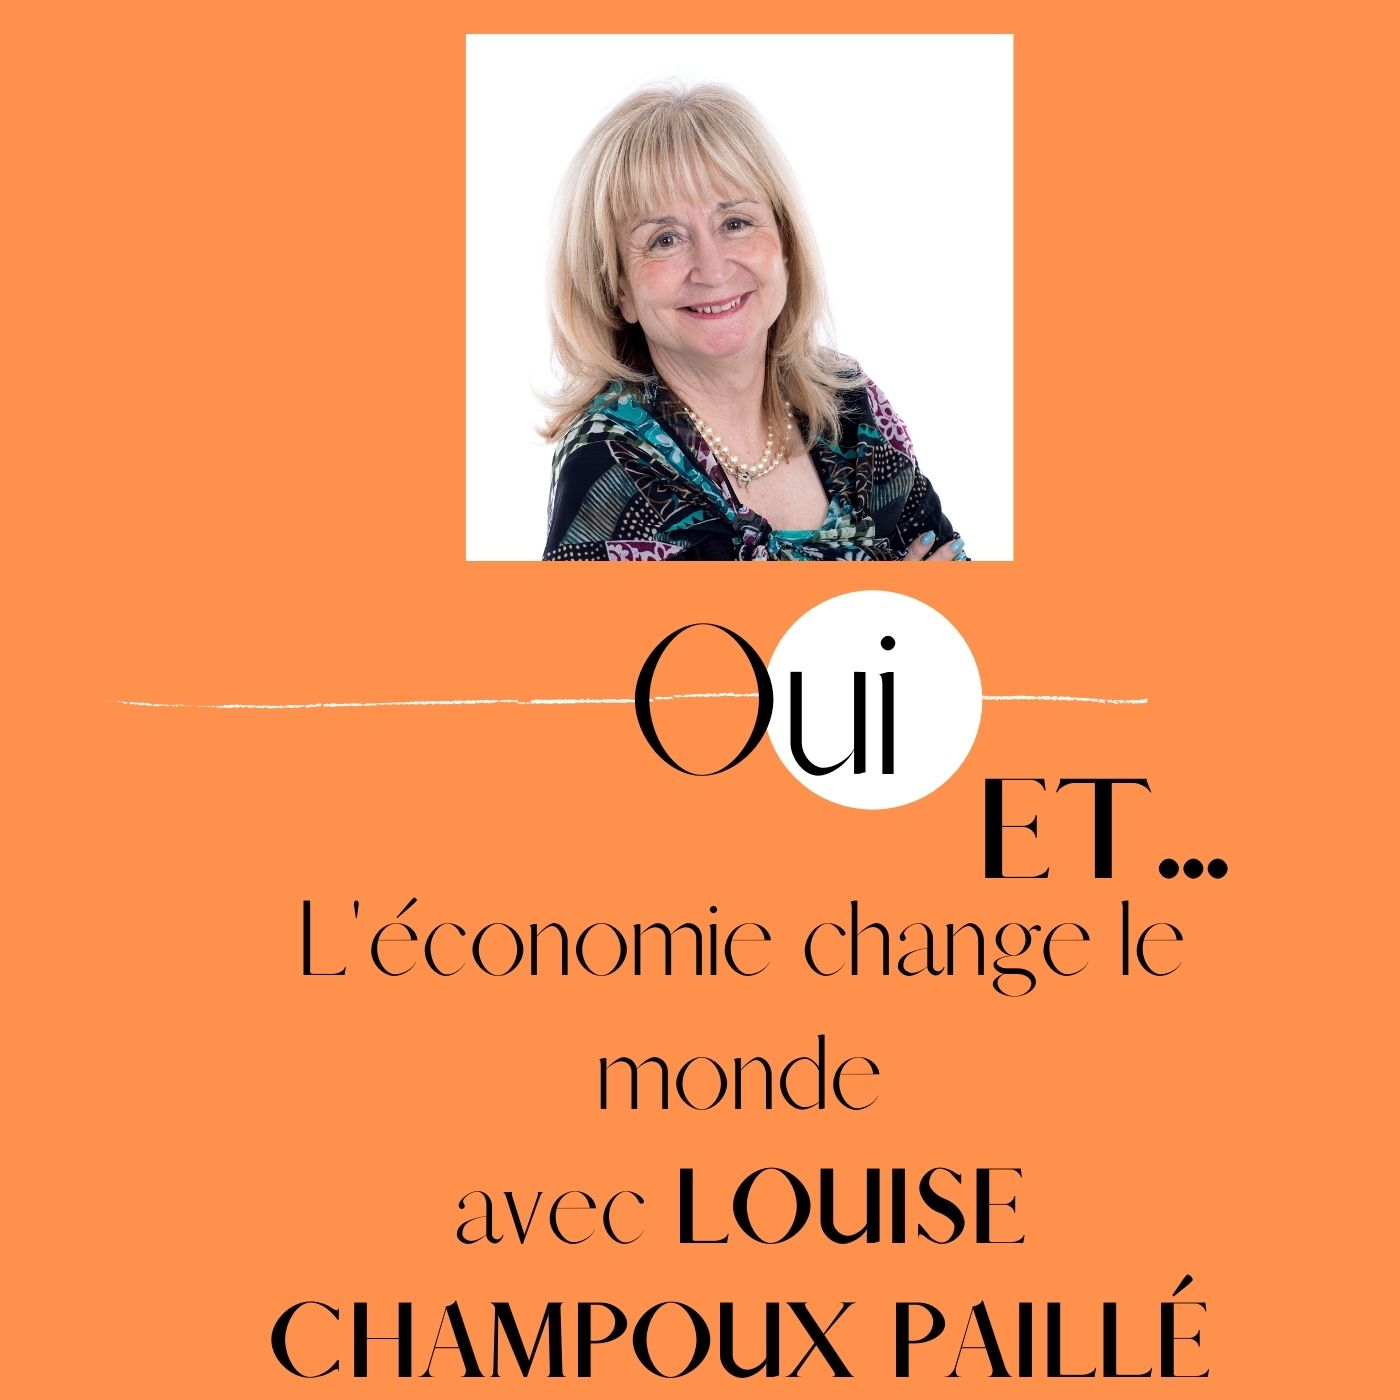 L'économie pour changer le monde – Available in French only